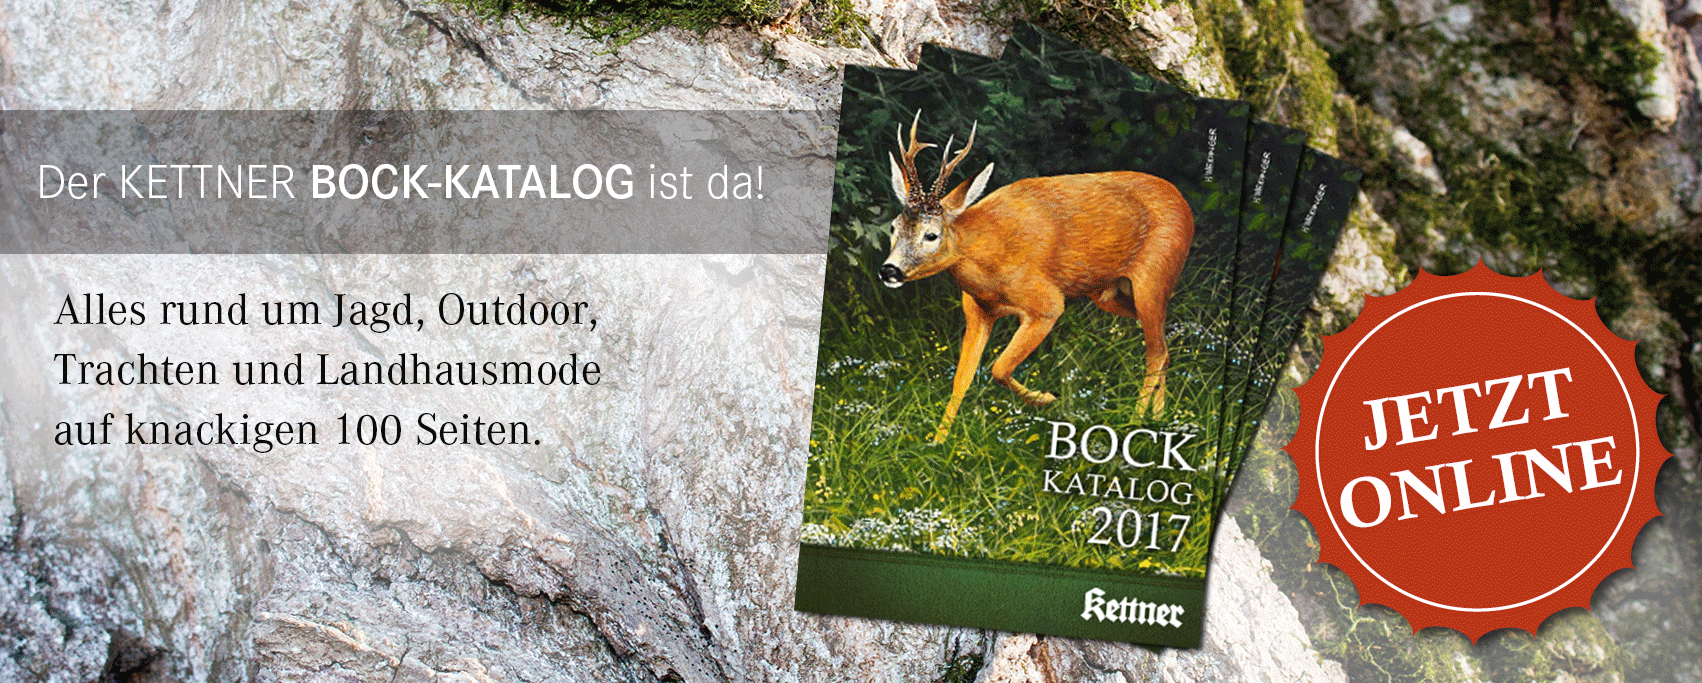 BOCK-Katalog 2017